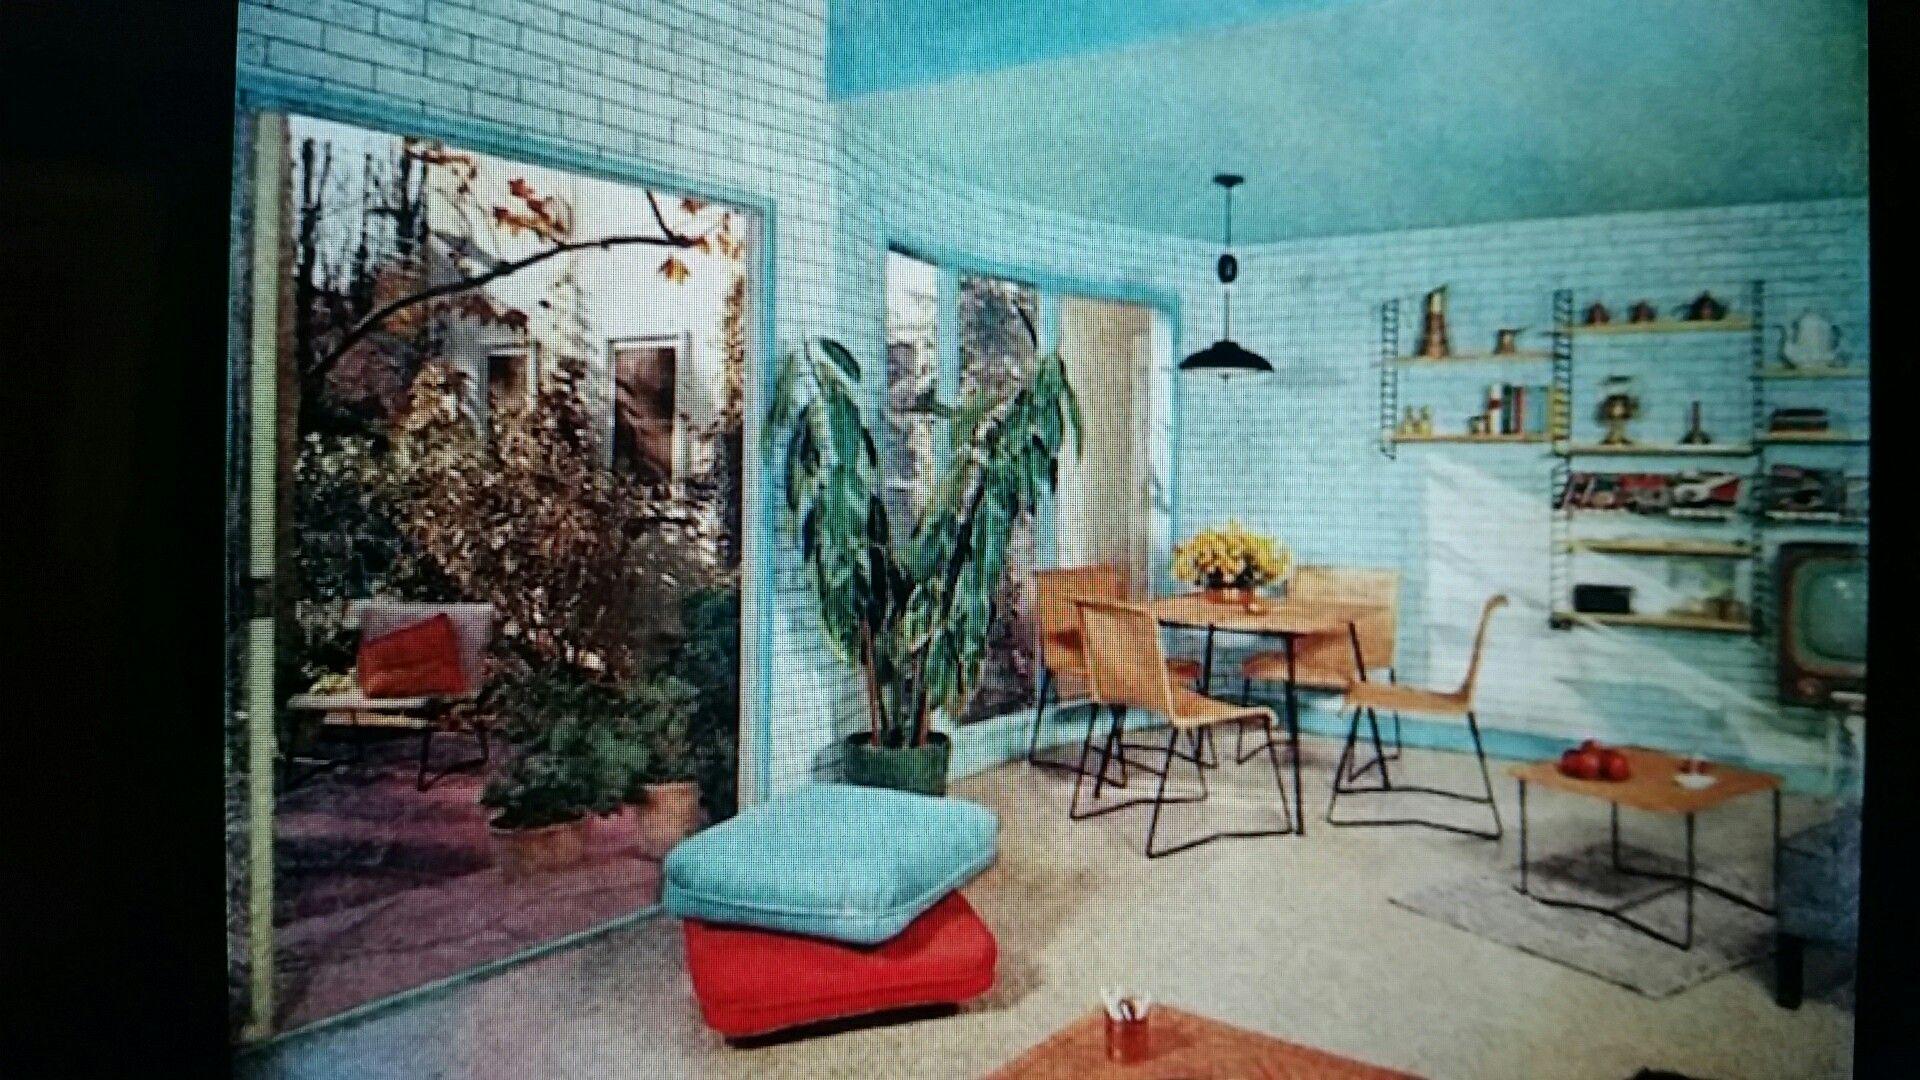 50 60s Simple 60s Interior Design Retro Interior Design Vintage Interior Design 60s style living room